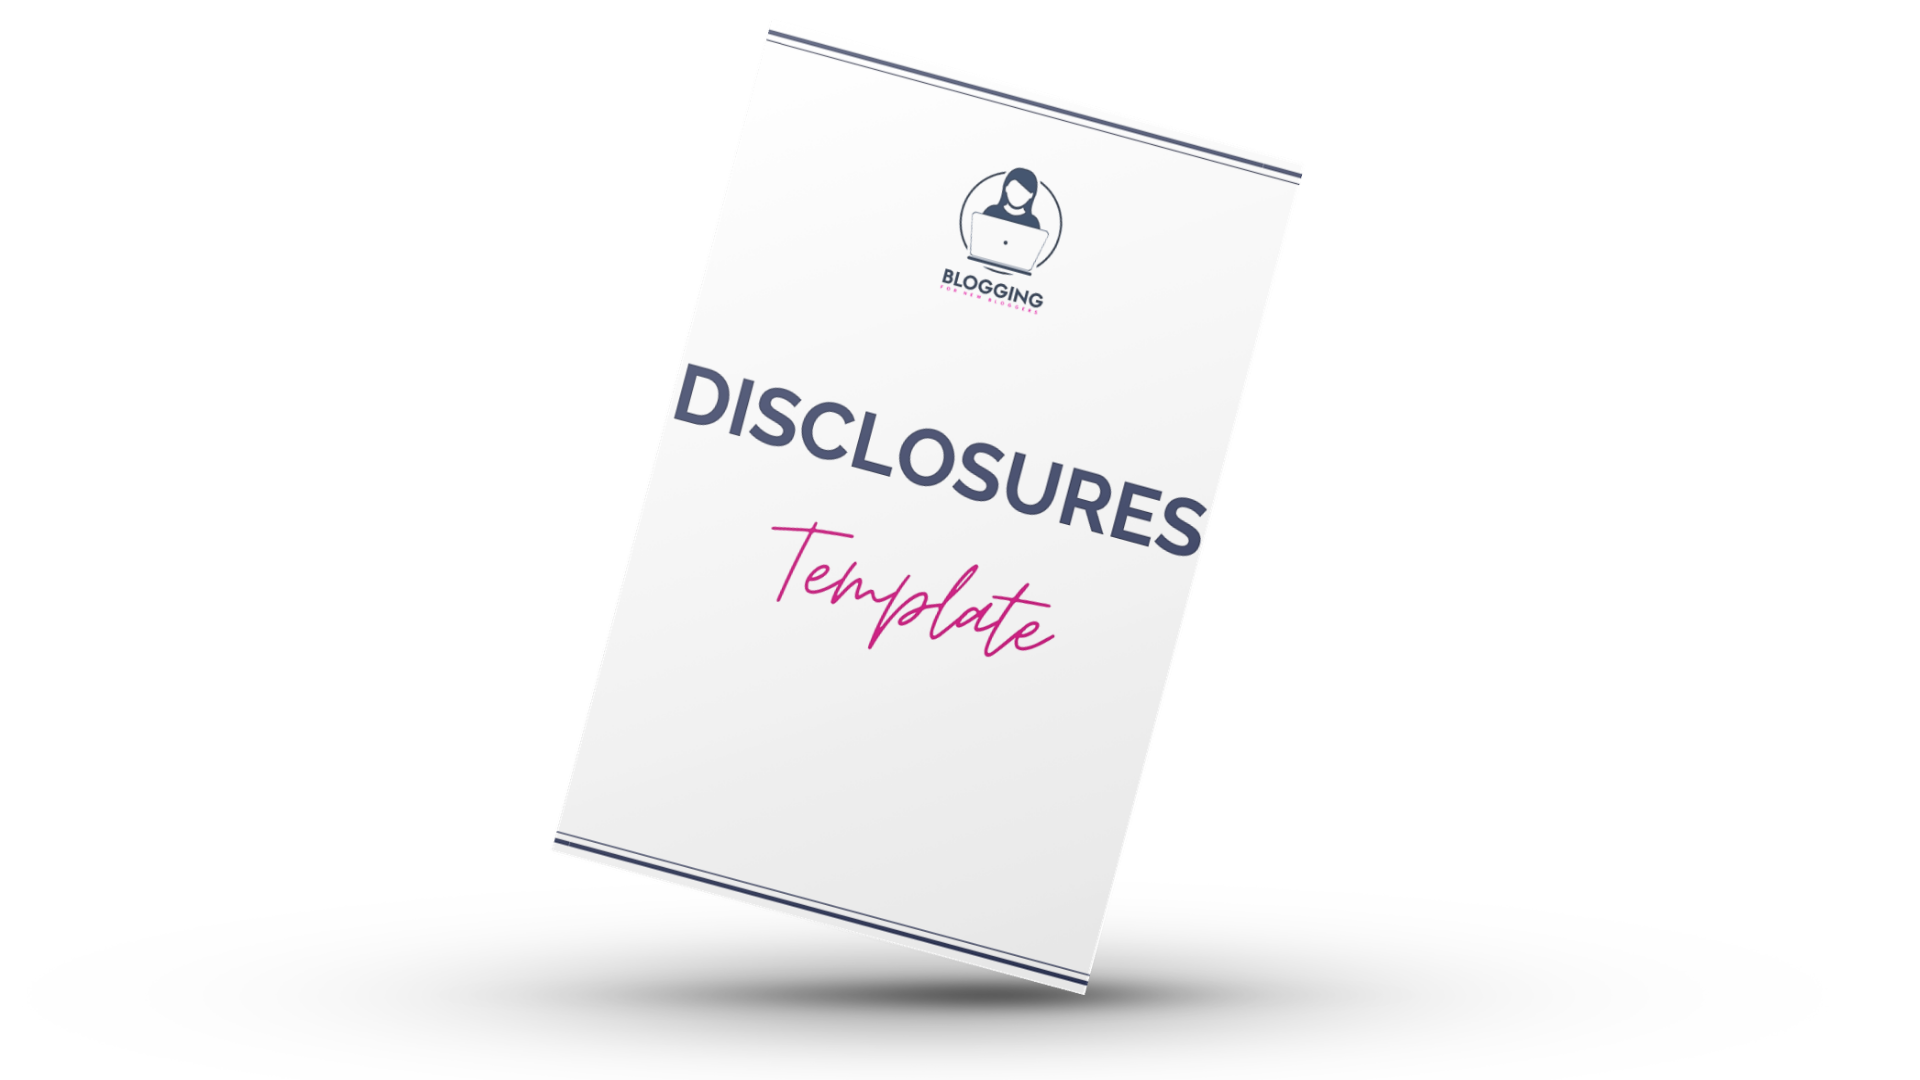 Affiliate disclusre template for blogs